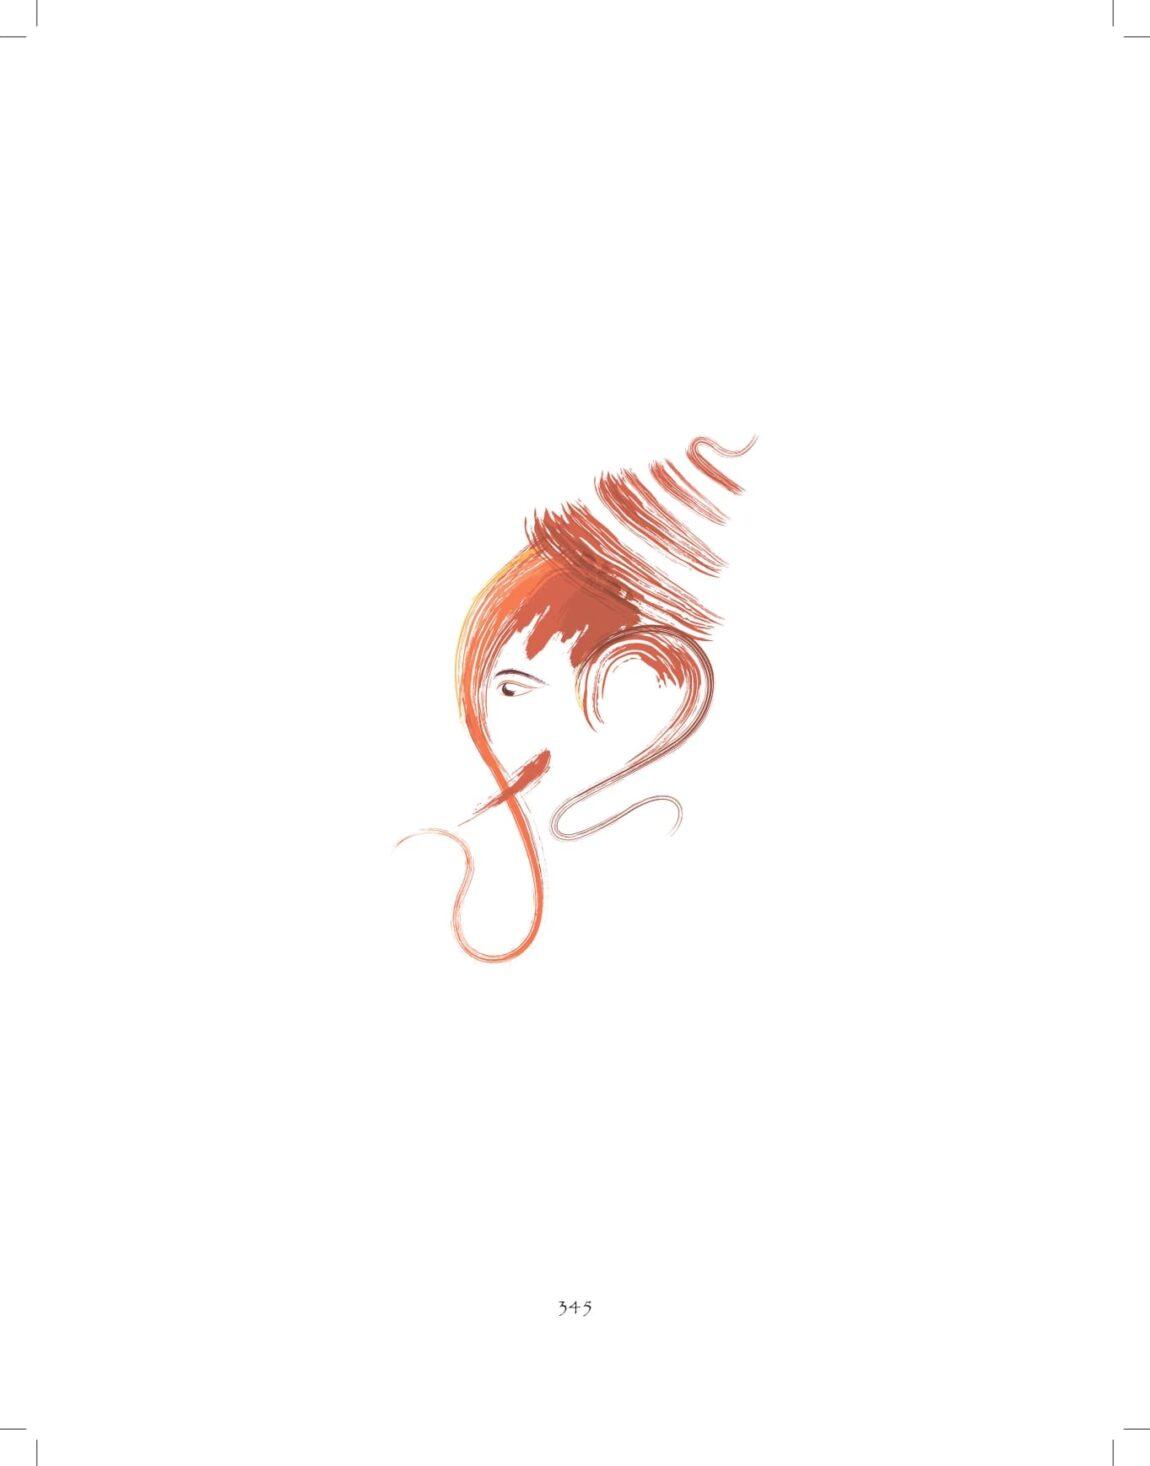 Ganesh-print_pages-to-jpg-0345.jpg